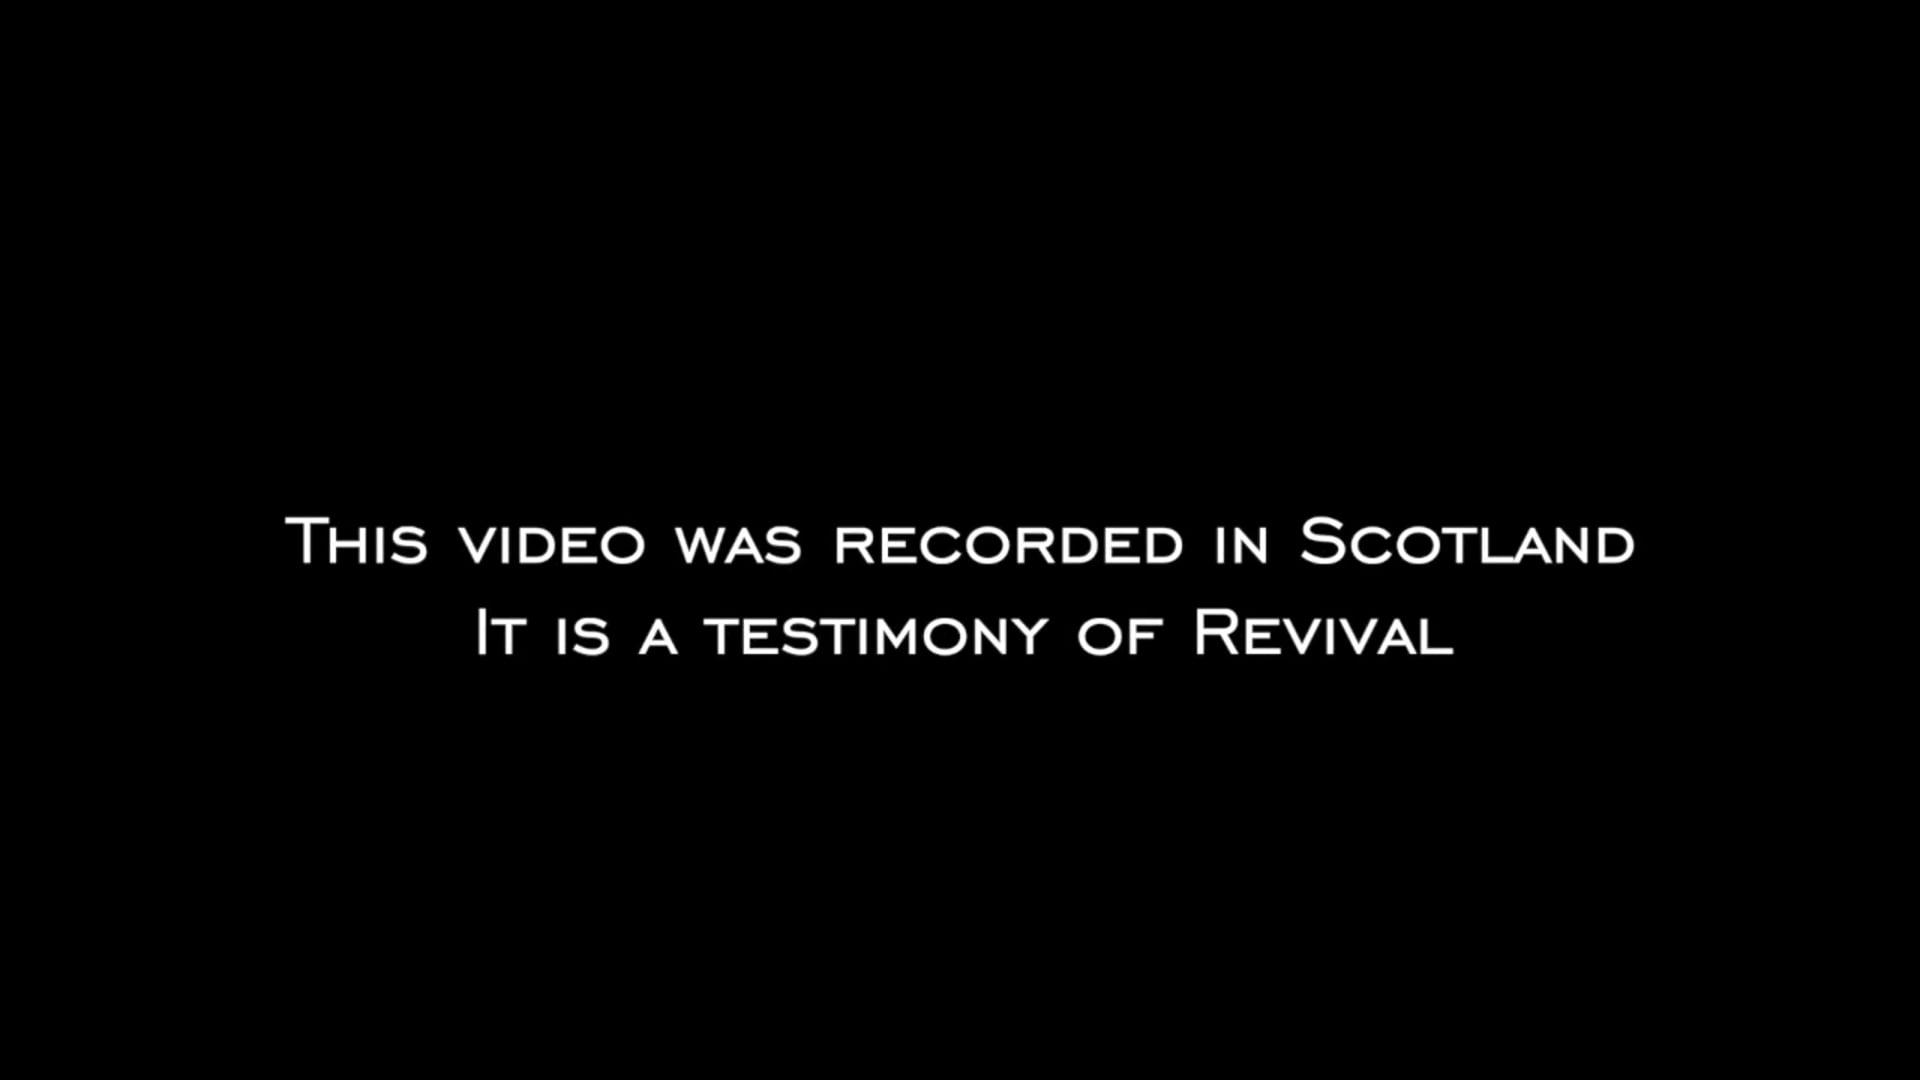 Dan Williams - A Testimony of Revival